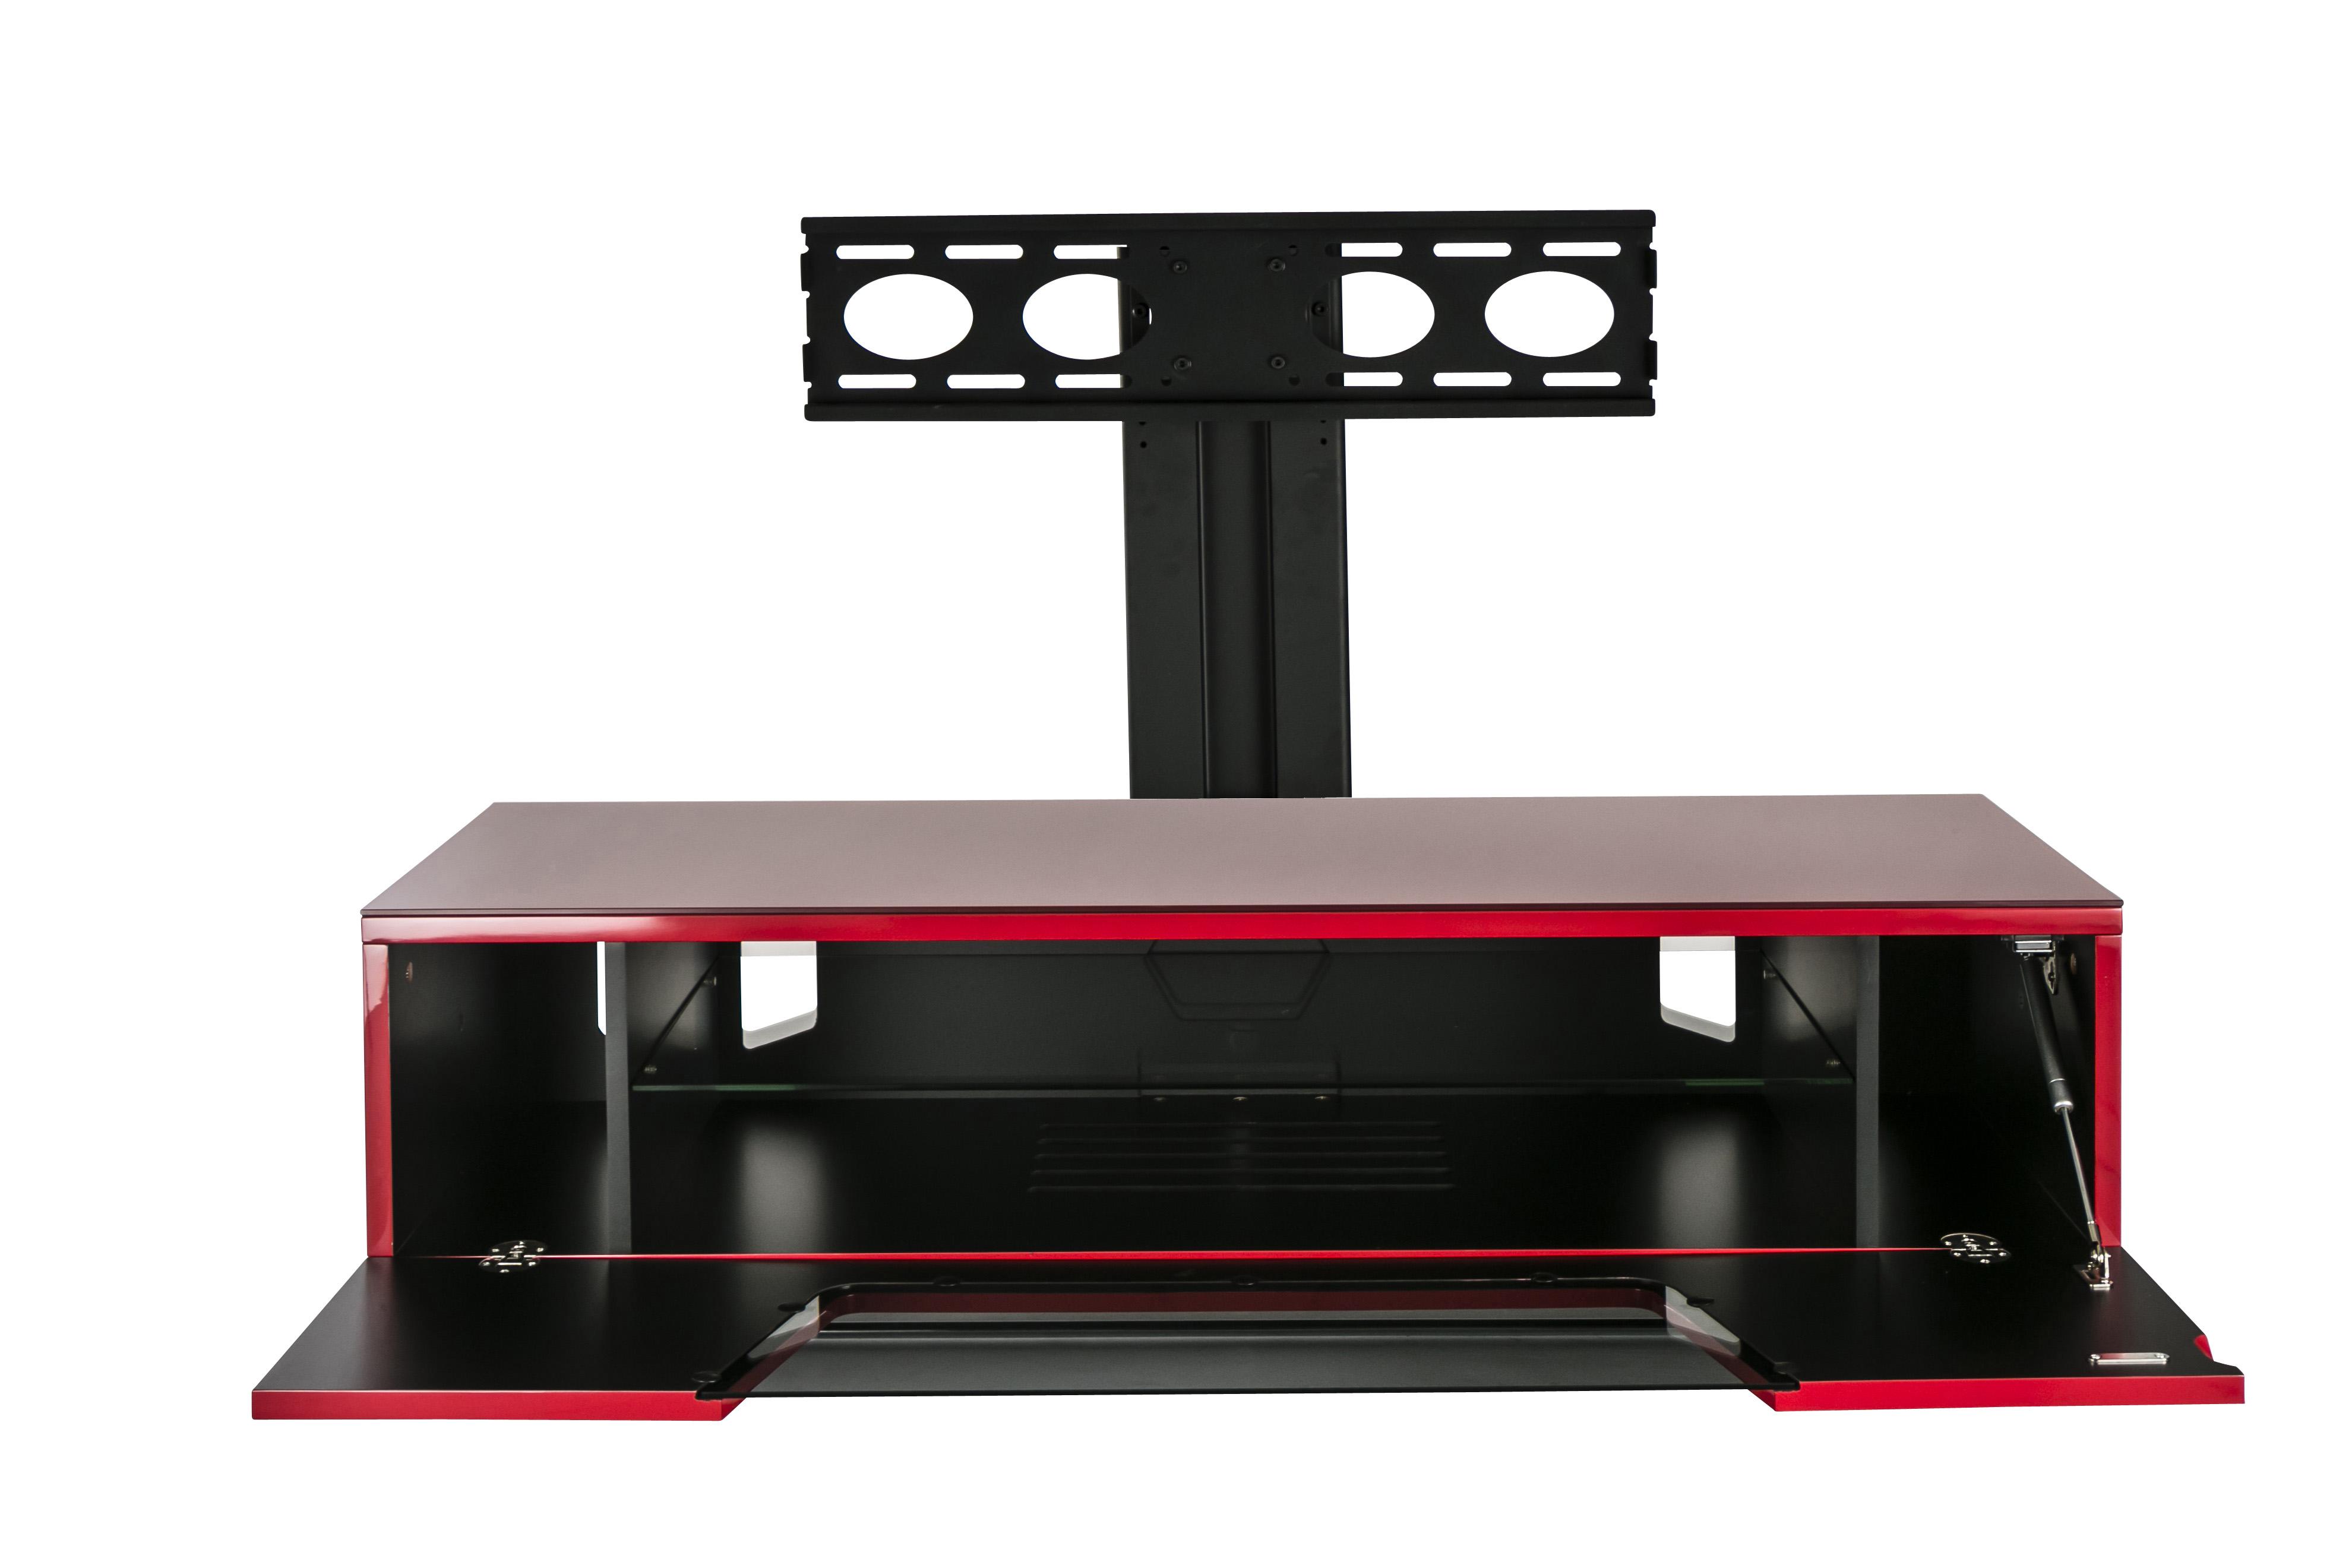 france marketing meuble tv chromium 1200mm avec potence. Black Bedroom Furniture Sets. Home Design Ideas